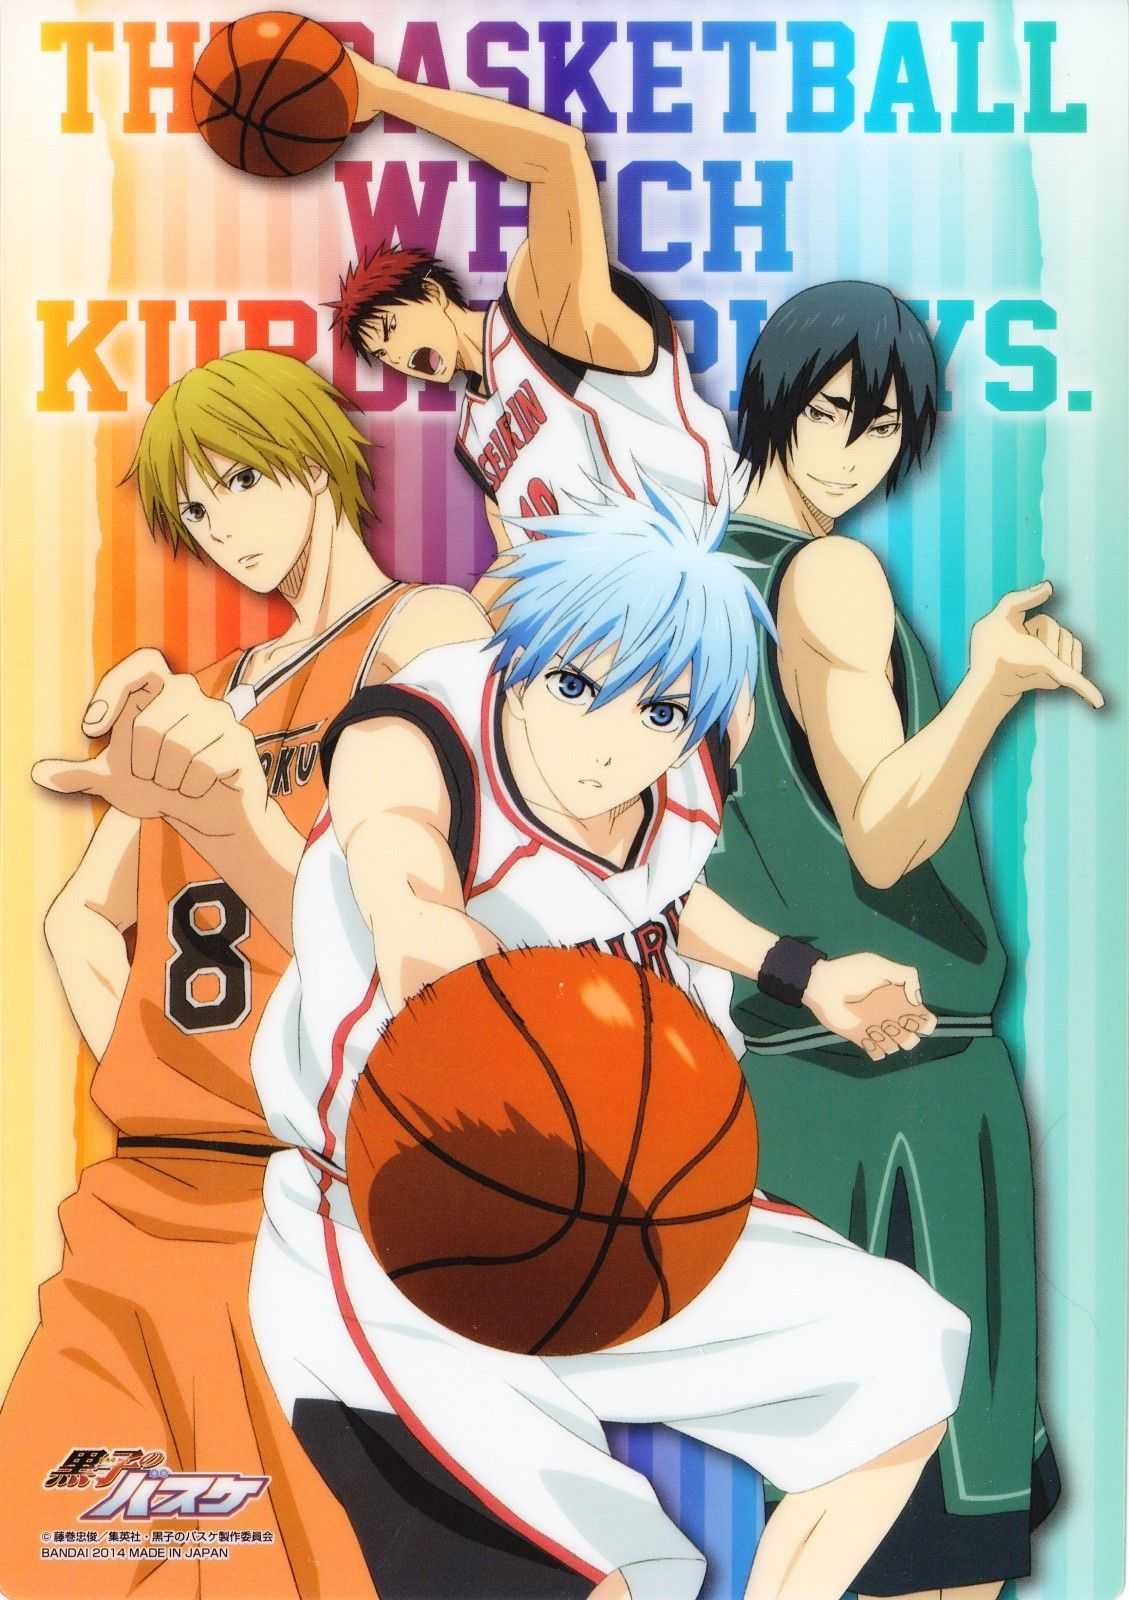 Google themes kuroko no basket - Kuroko No Basket Poster Anime Art Silk Wall Posters 24x34 Krnb15 China Mainland